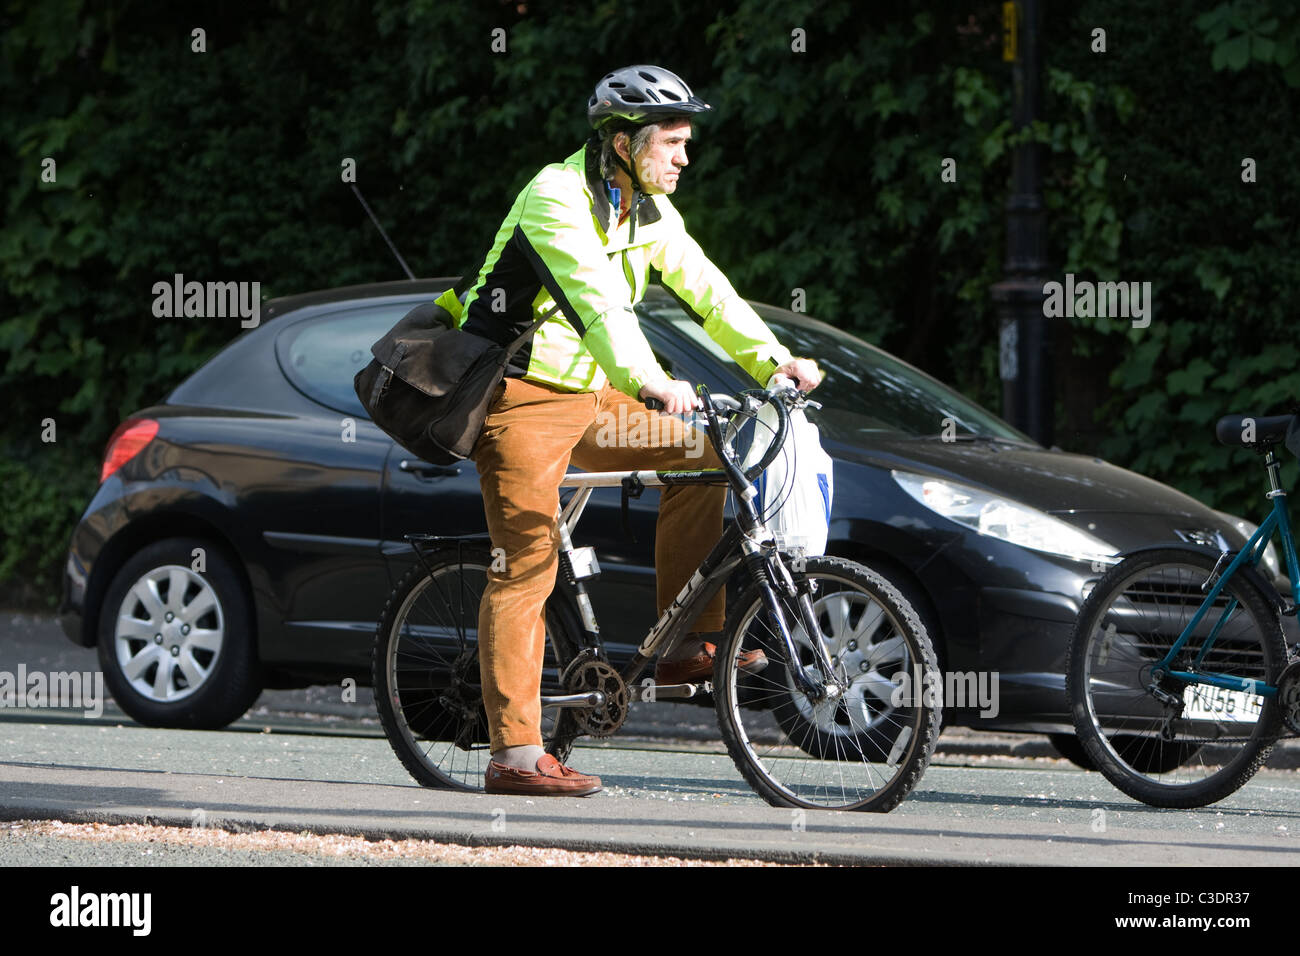 Man on bike wearing a Hi Vis vest Stock Photo